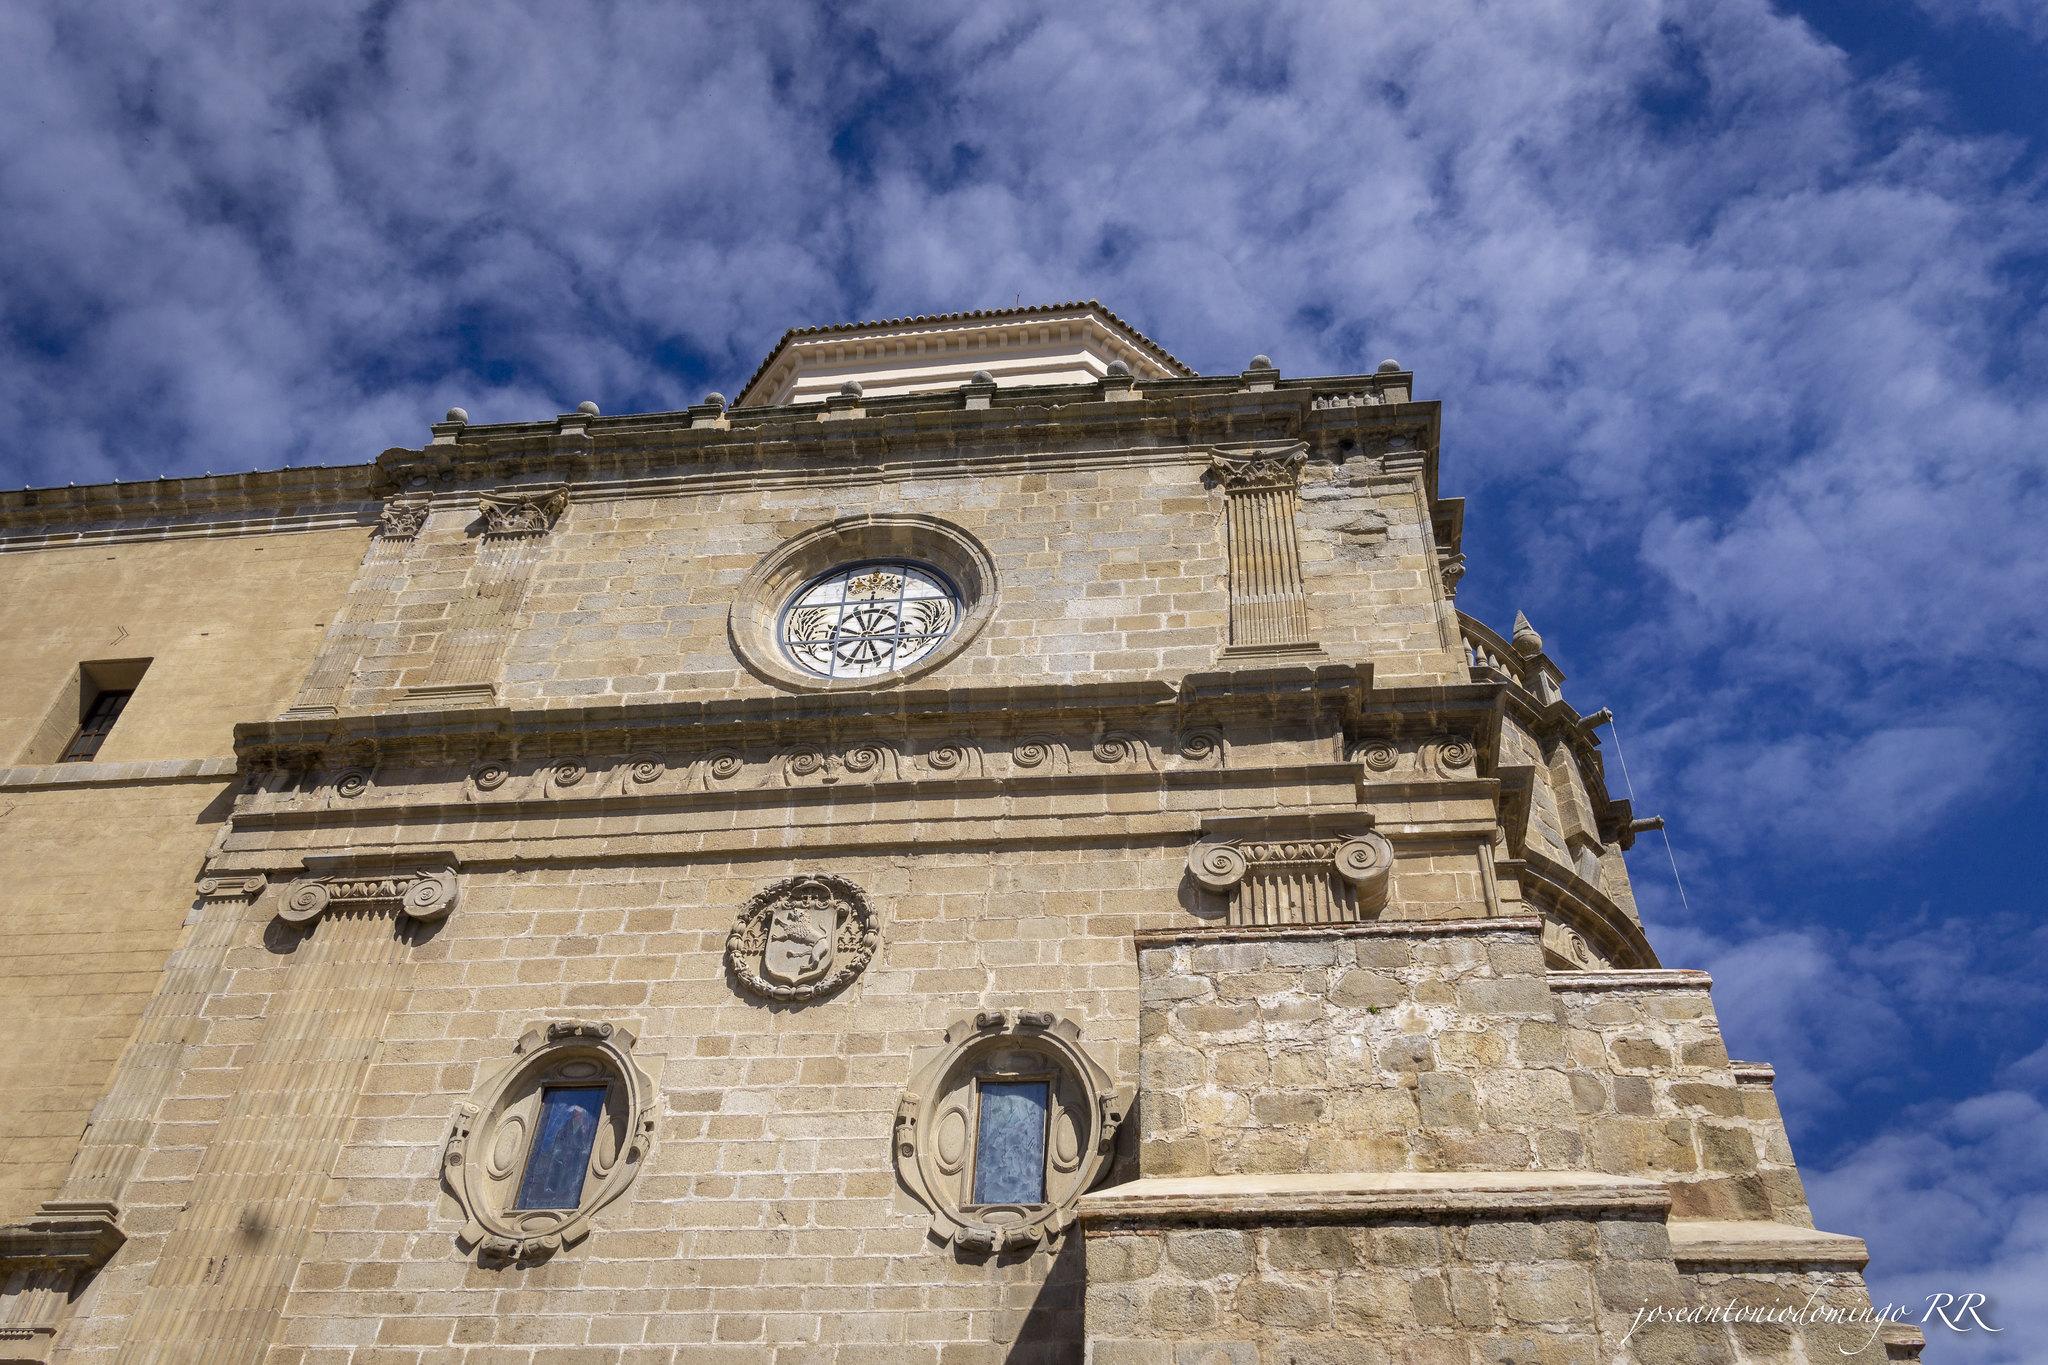 Iglesia de San Prudencio